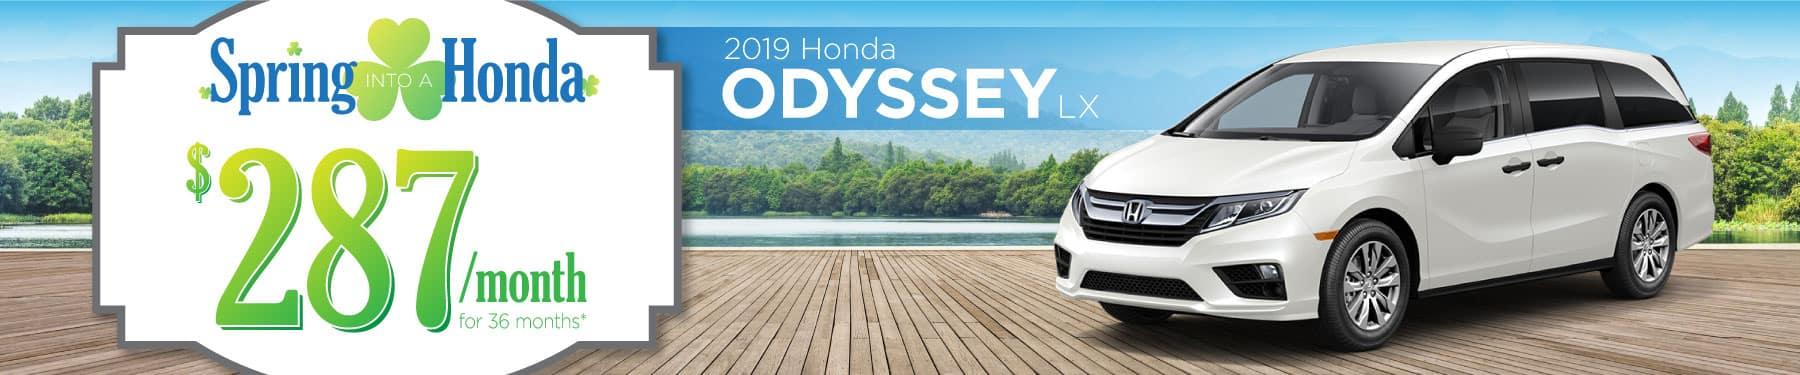 Header Photo of the 2019 Honda Odyssey